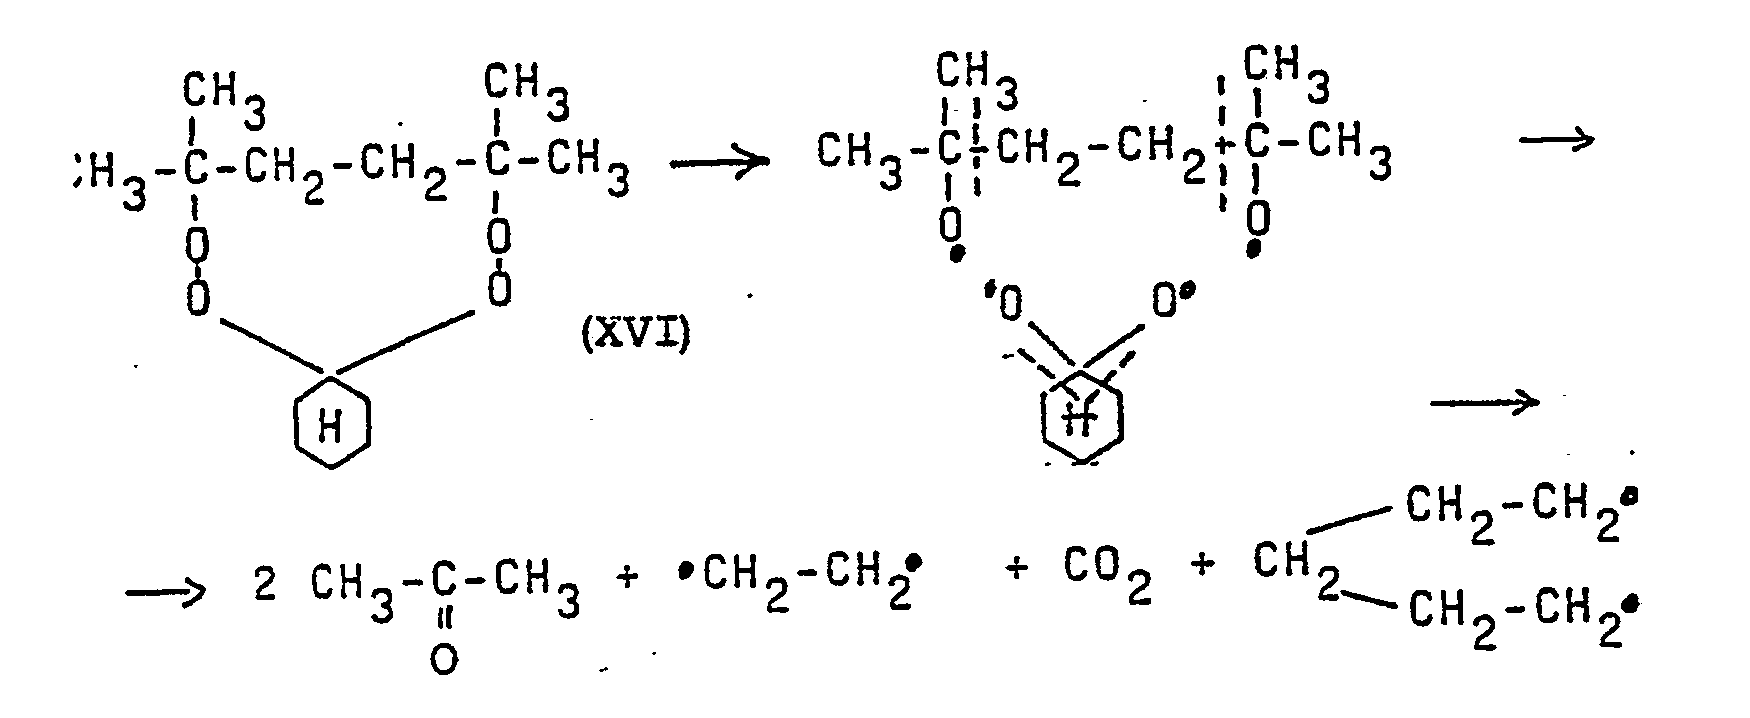 Butylbenzol